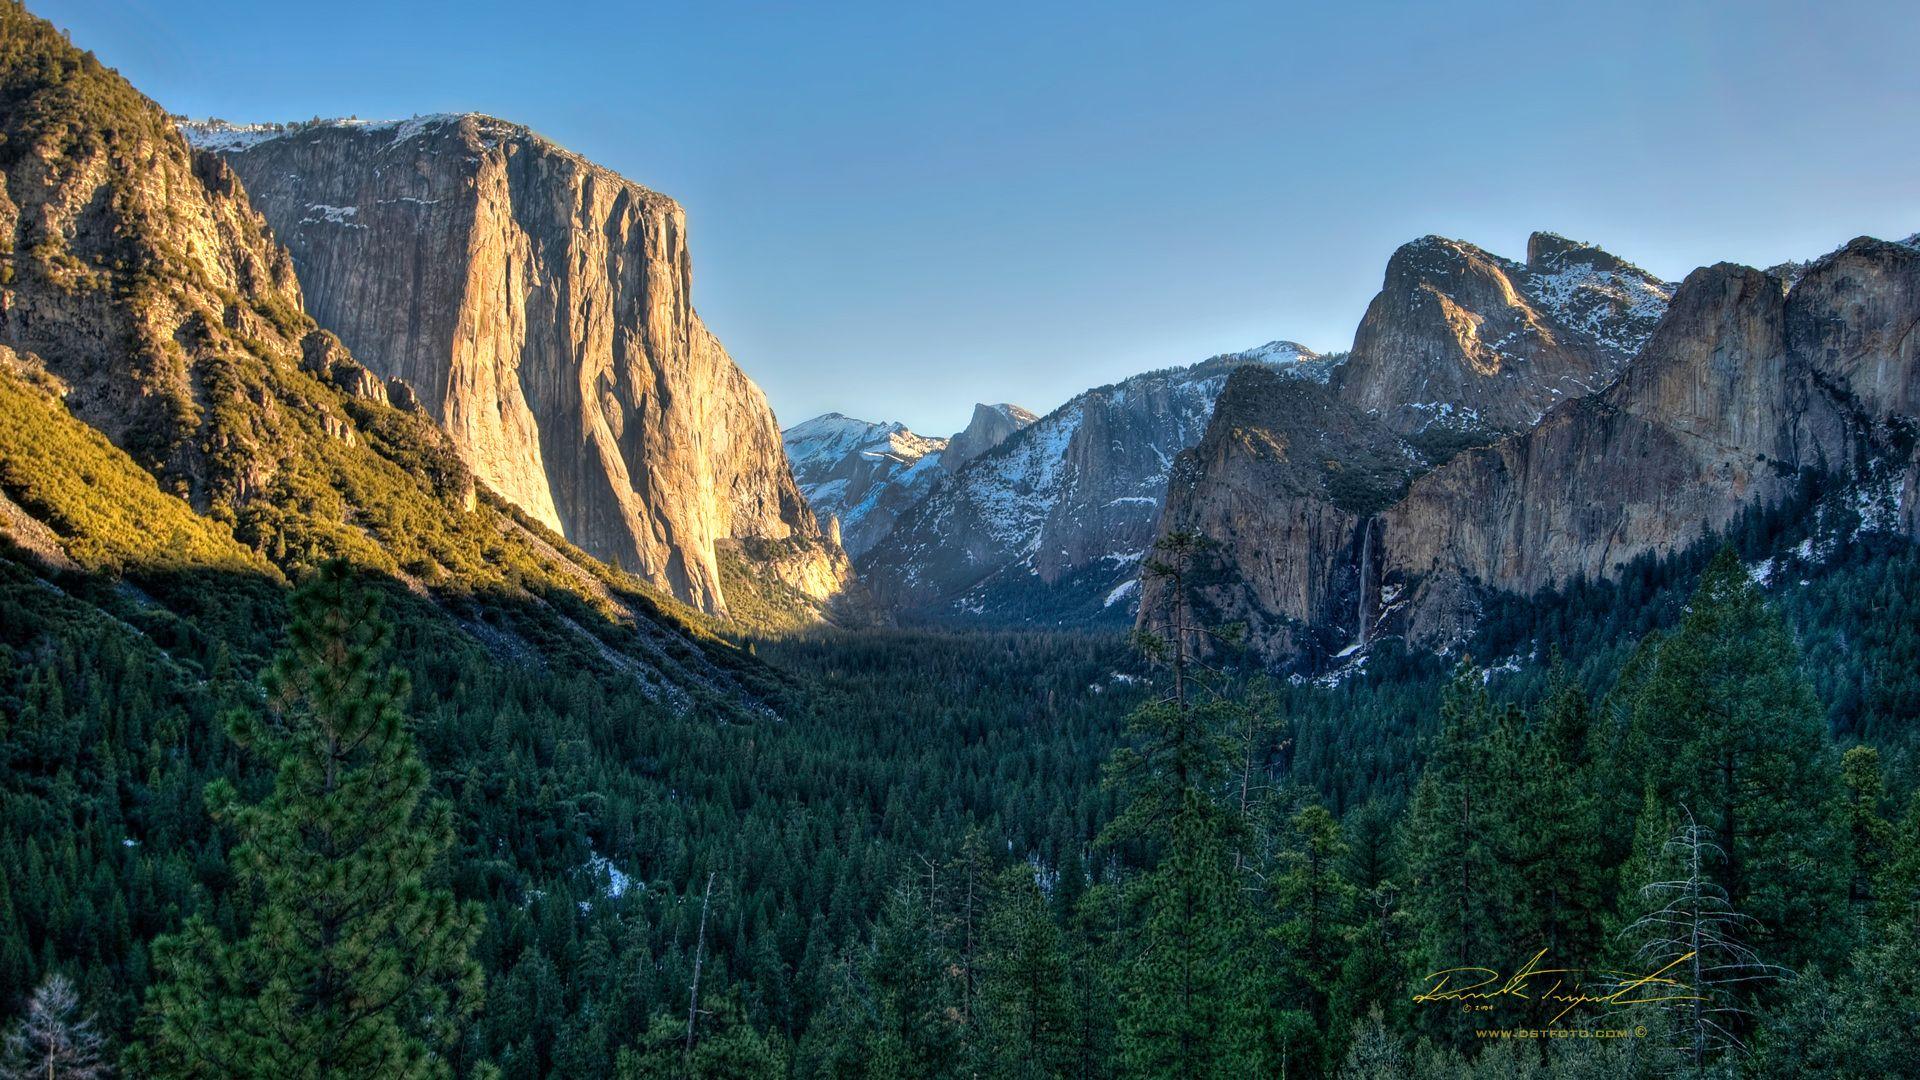 Mobile And Desktop Wallpaper Hd Yosemite Wallpaper Yosemite Yosemite Valley